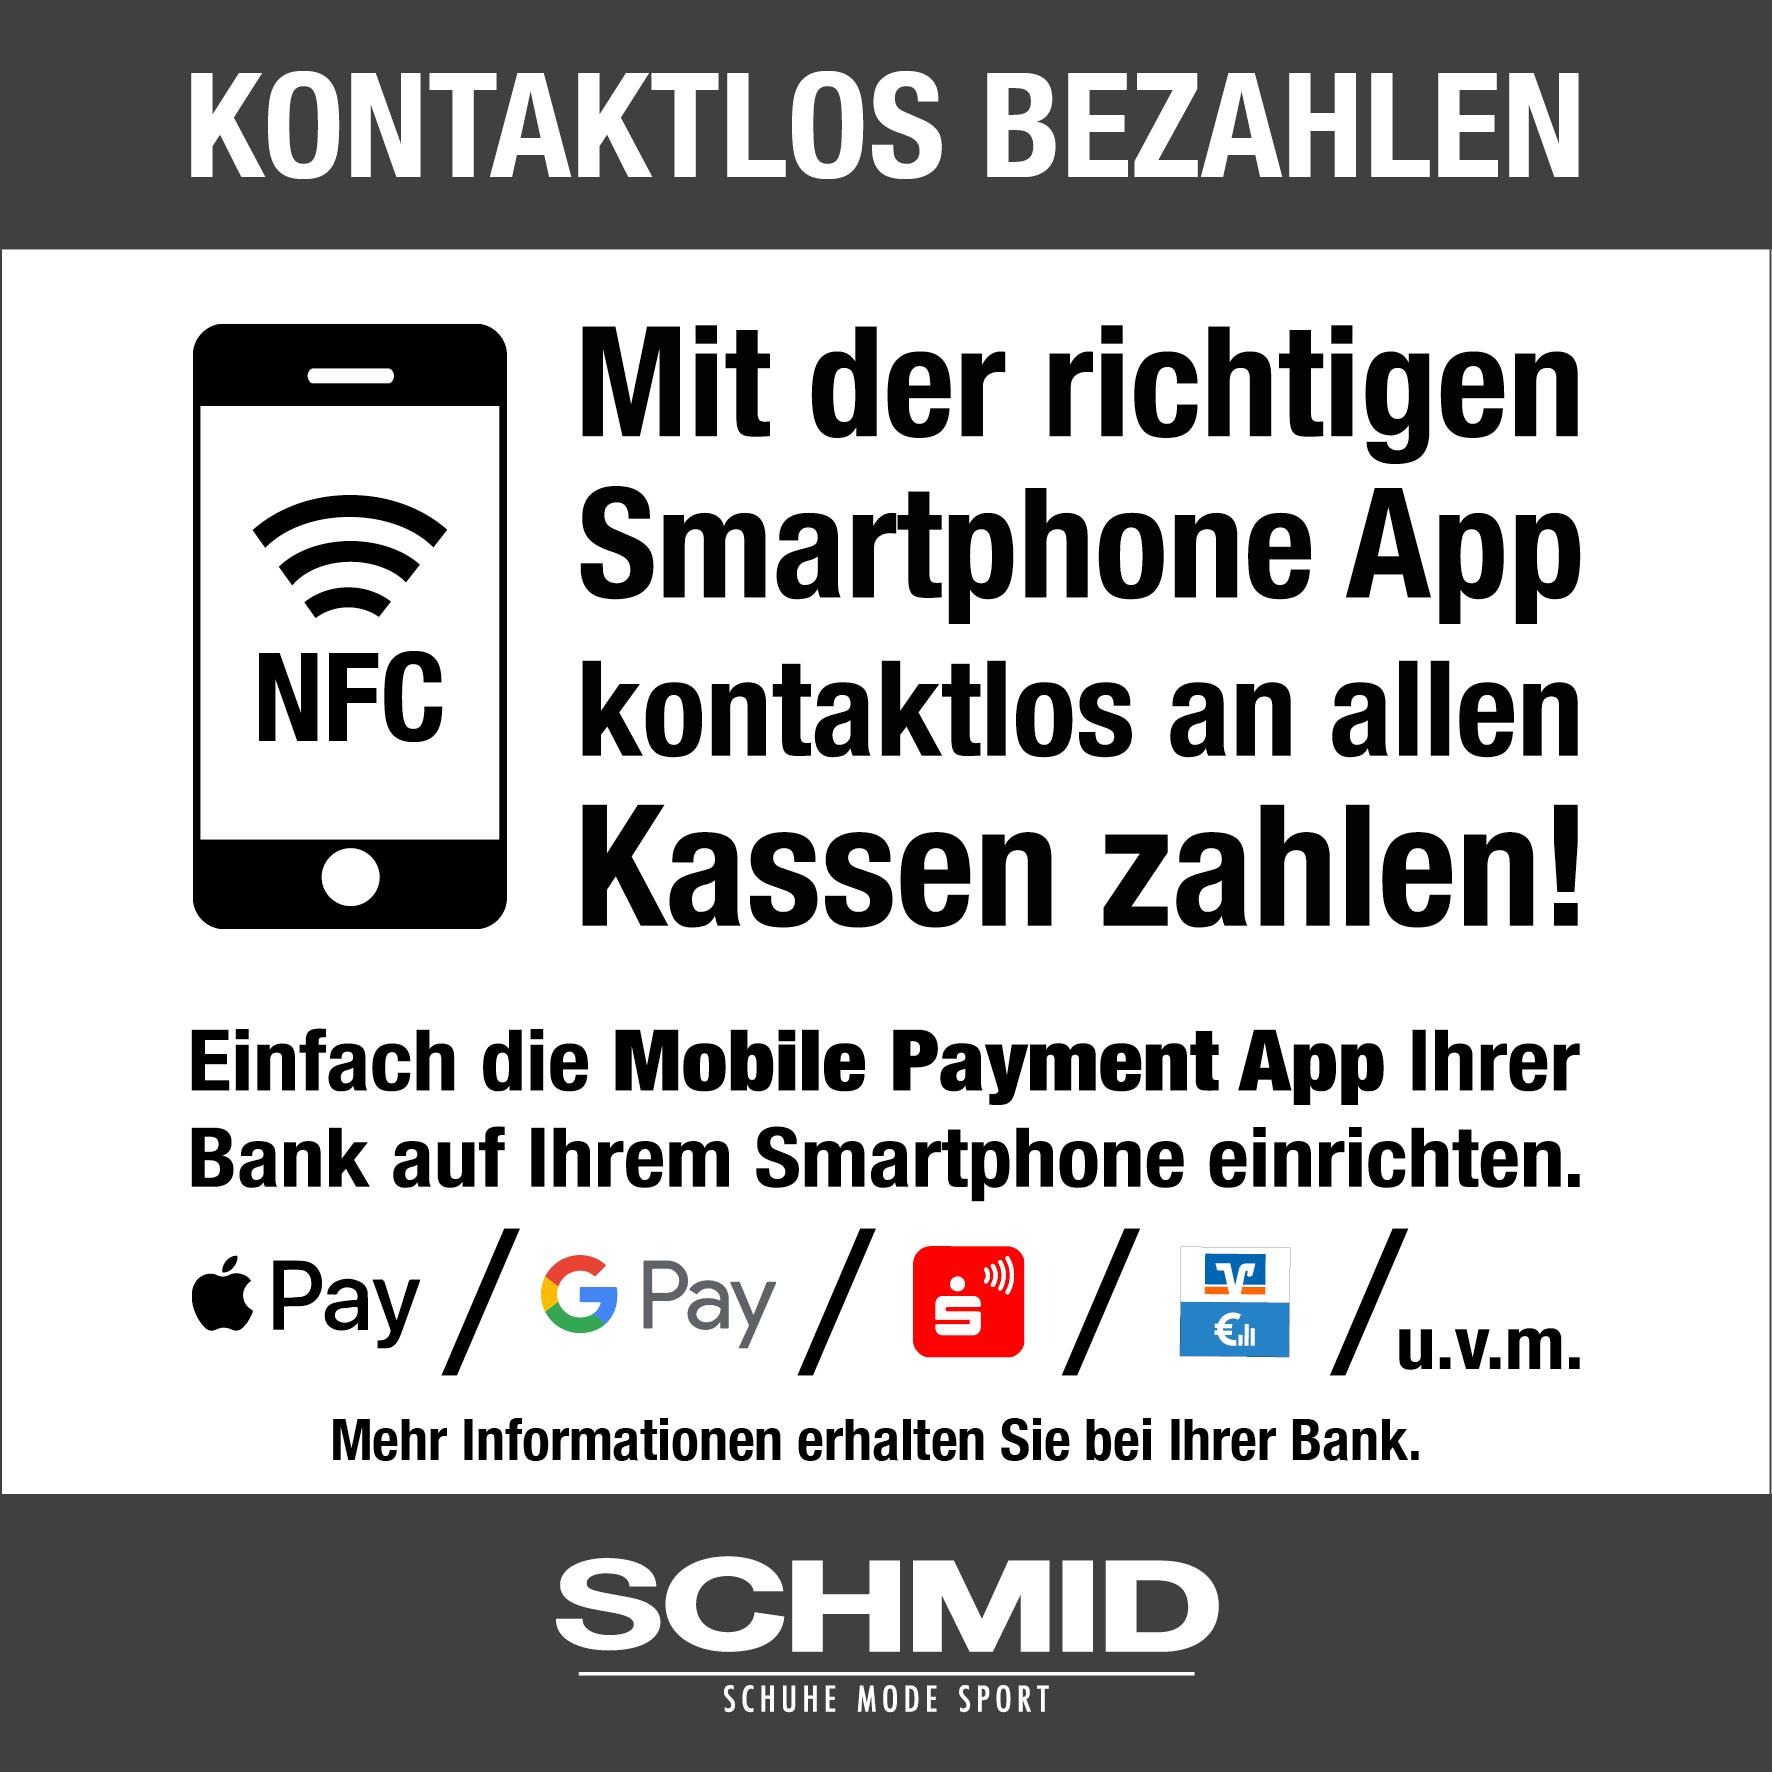 SCHMID News und Aktion | SCHMID Onlineshop